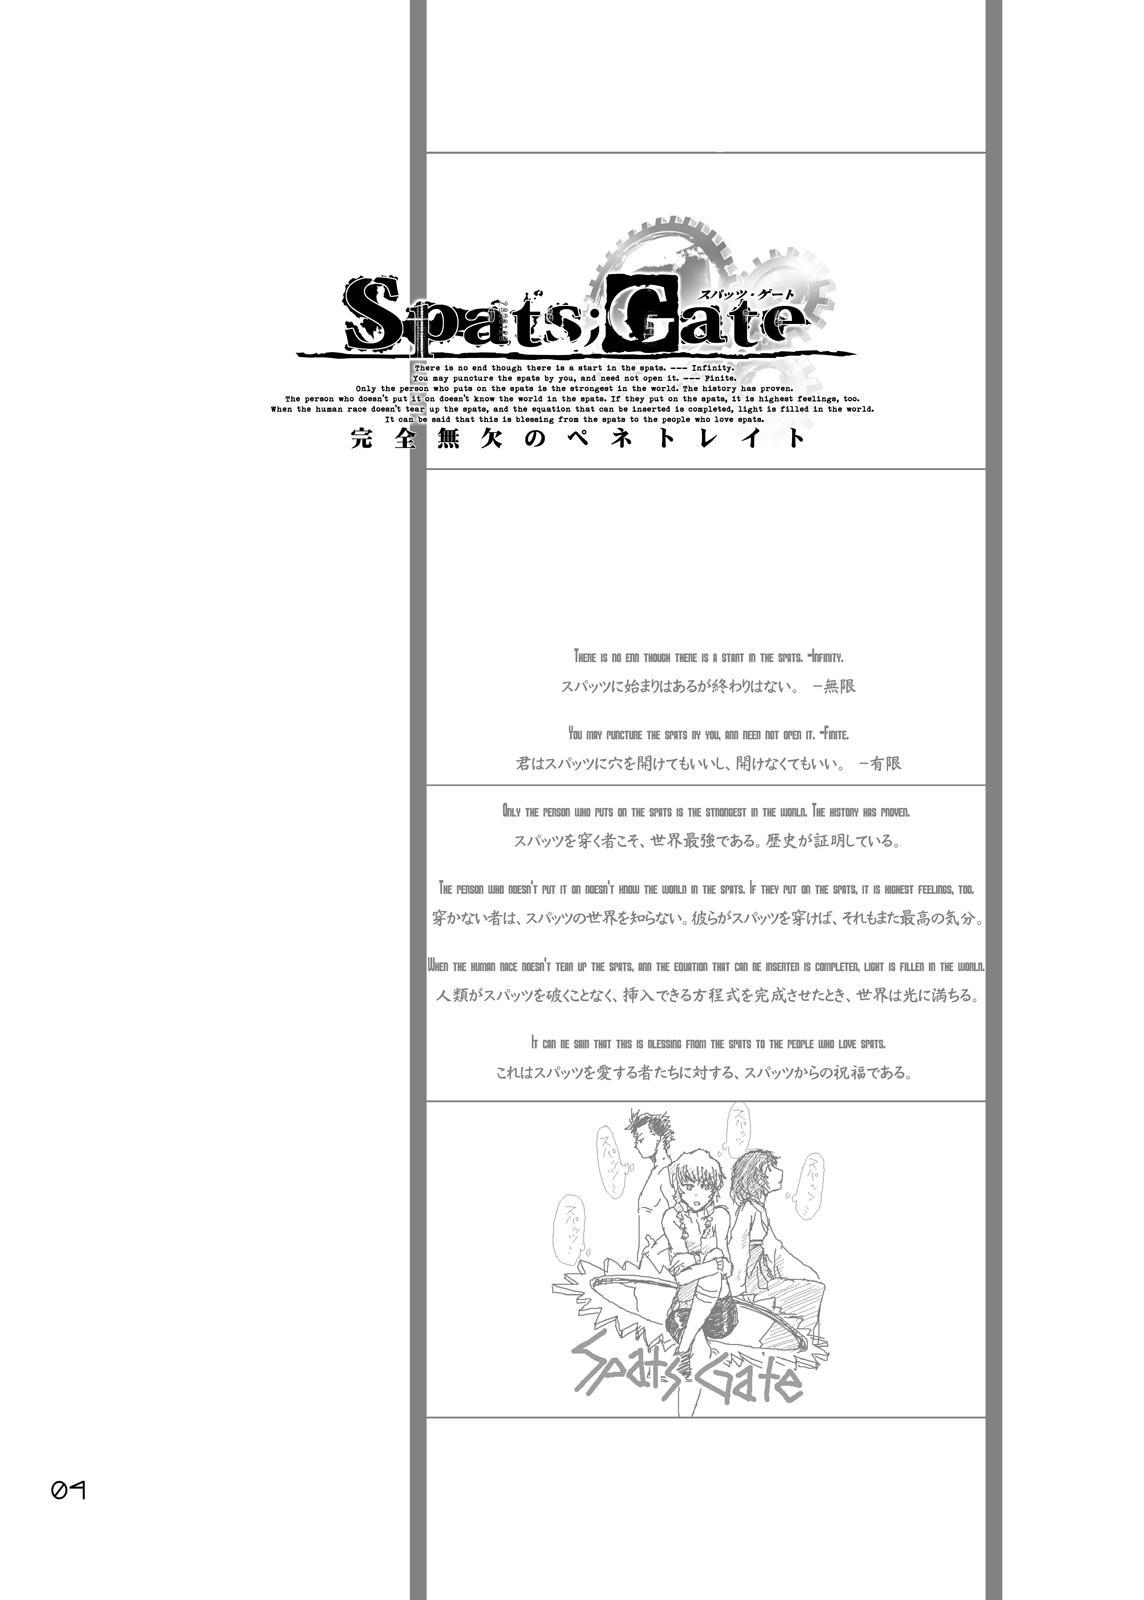 Spats;Gate Absoluteness Penetrate 2